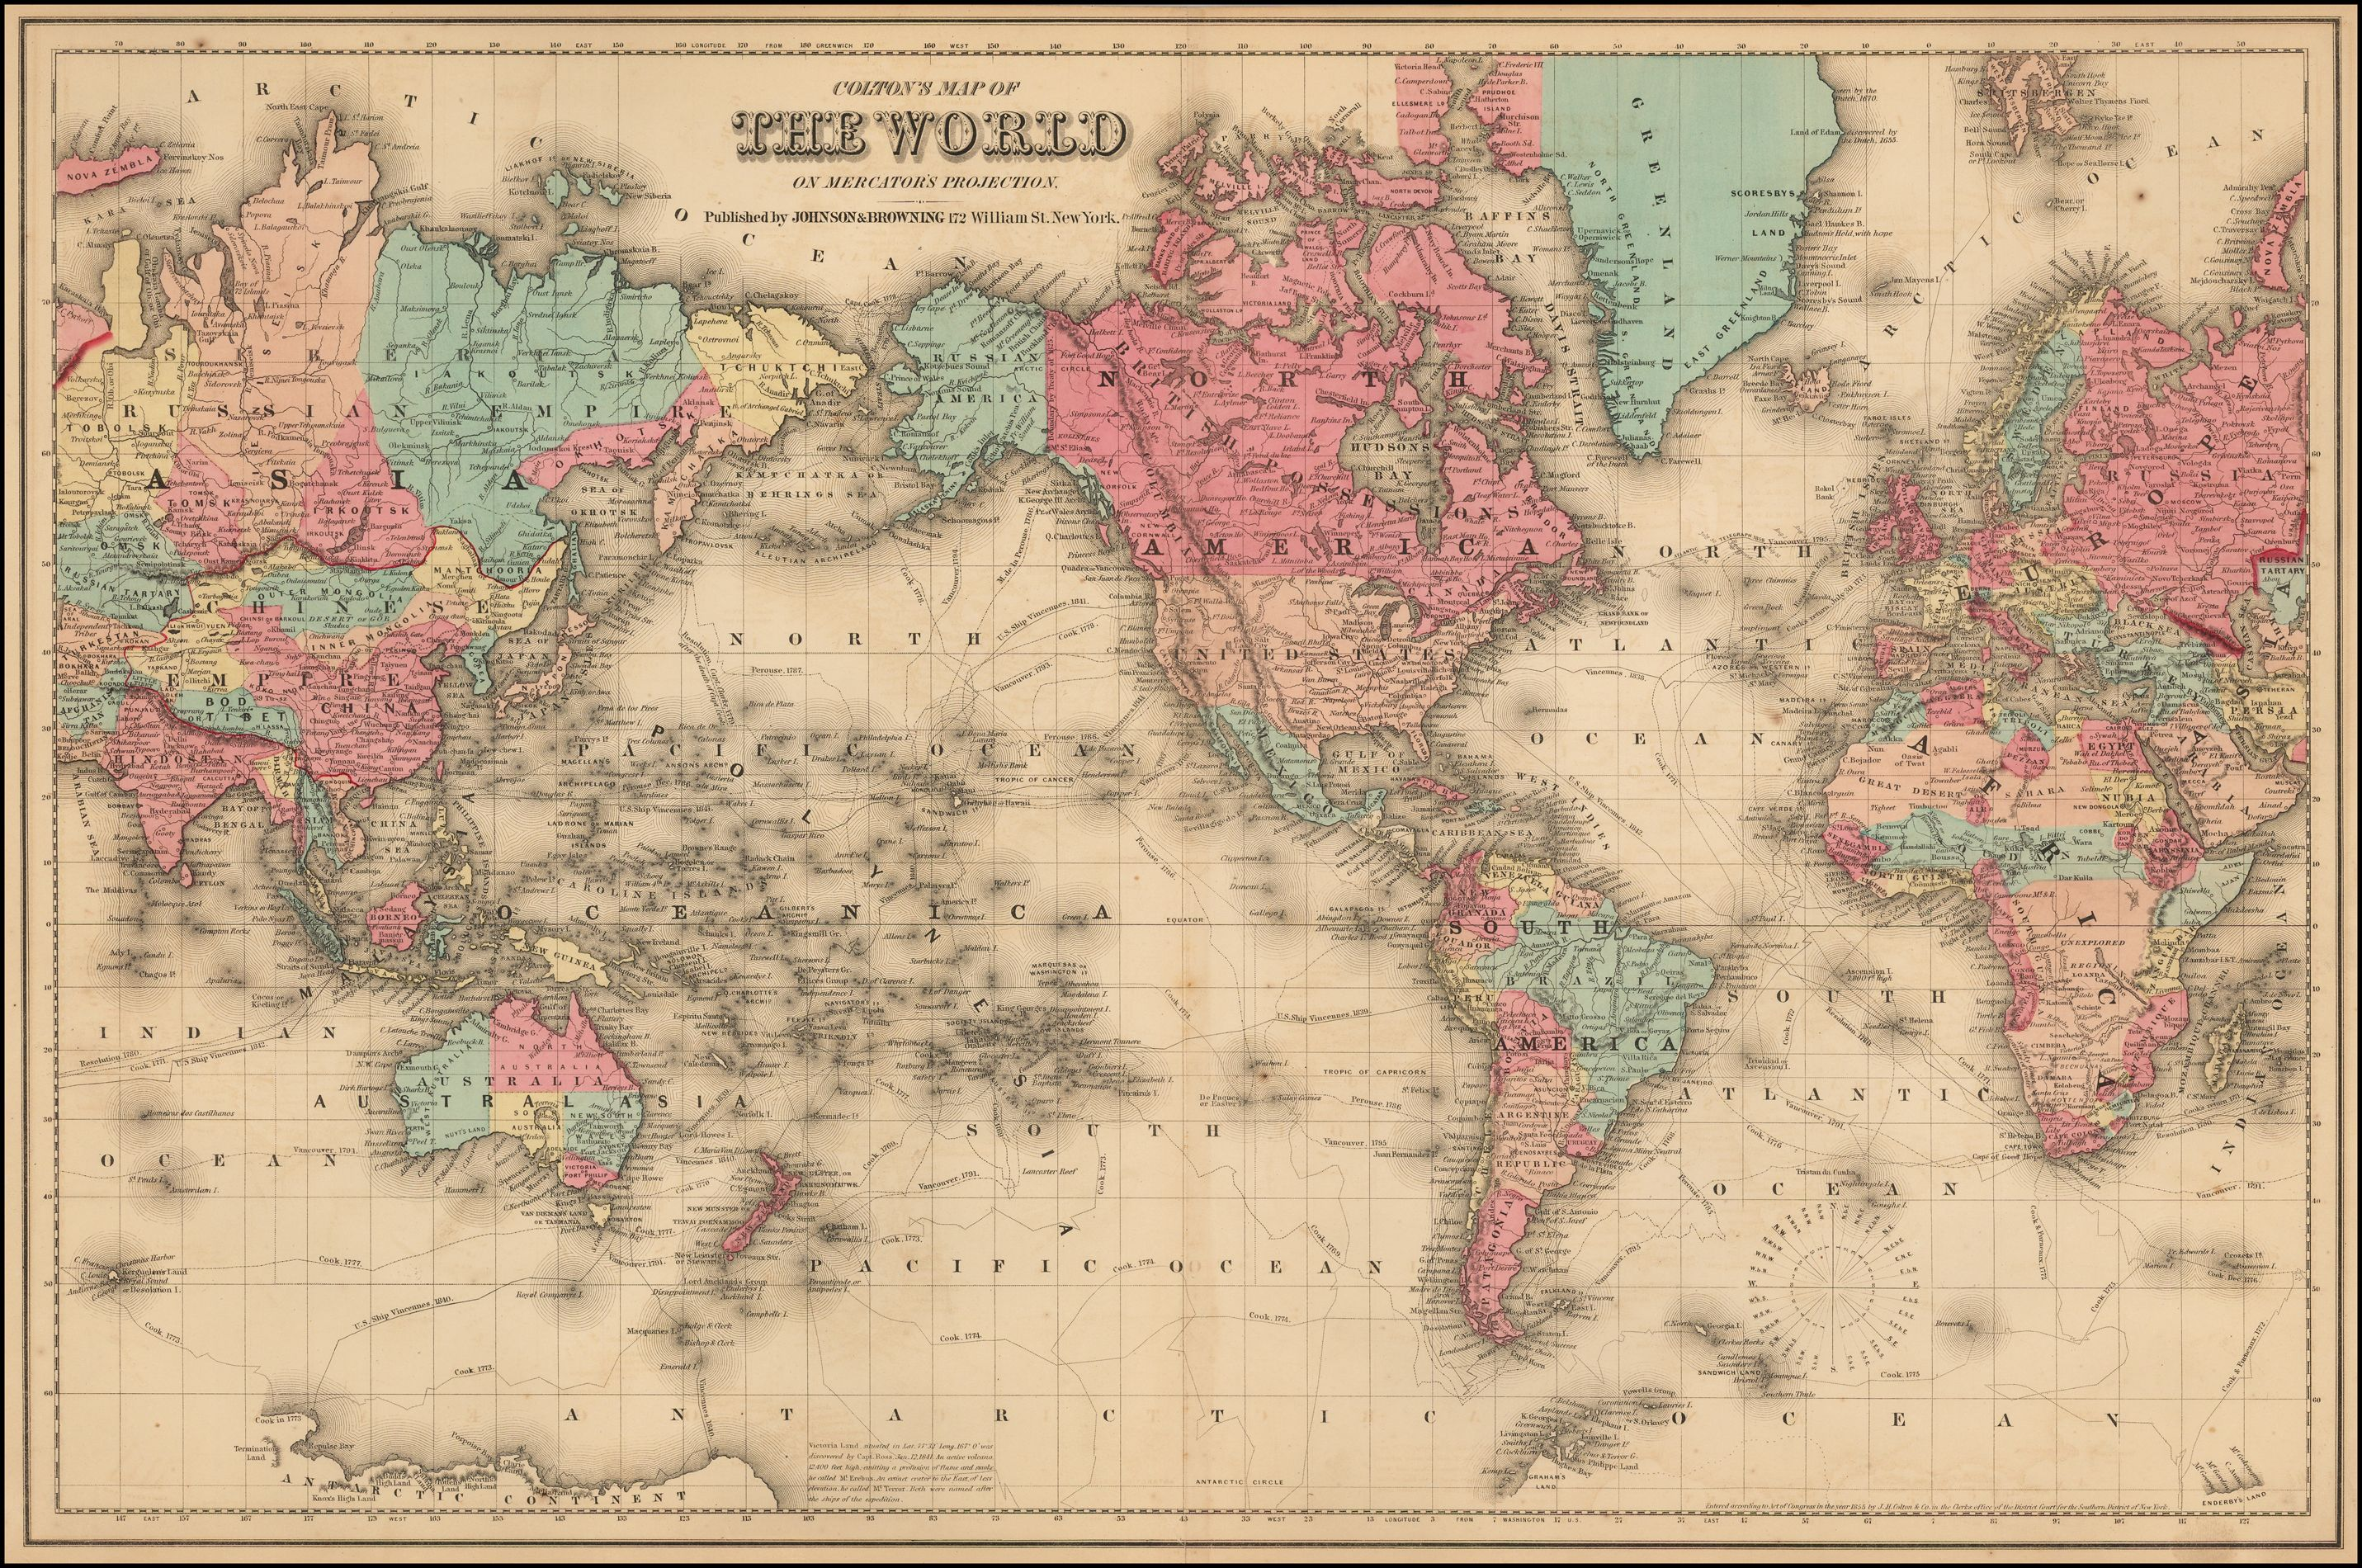 World map, ca. 1872